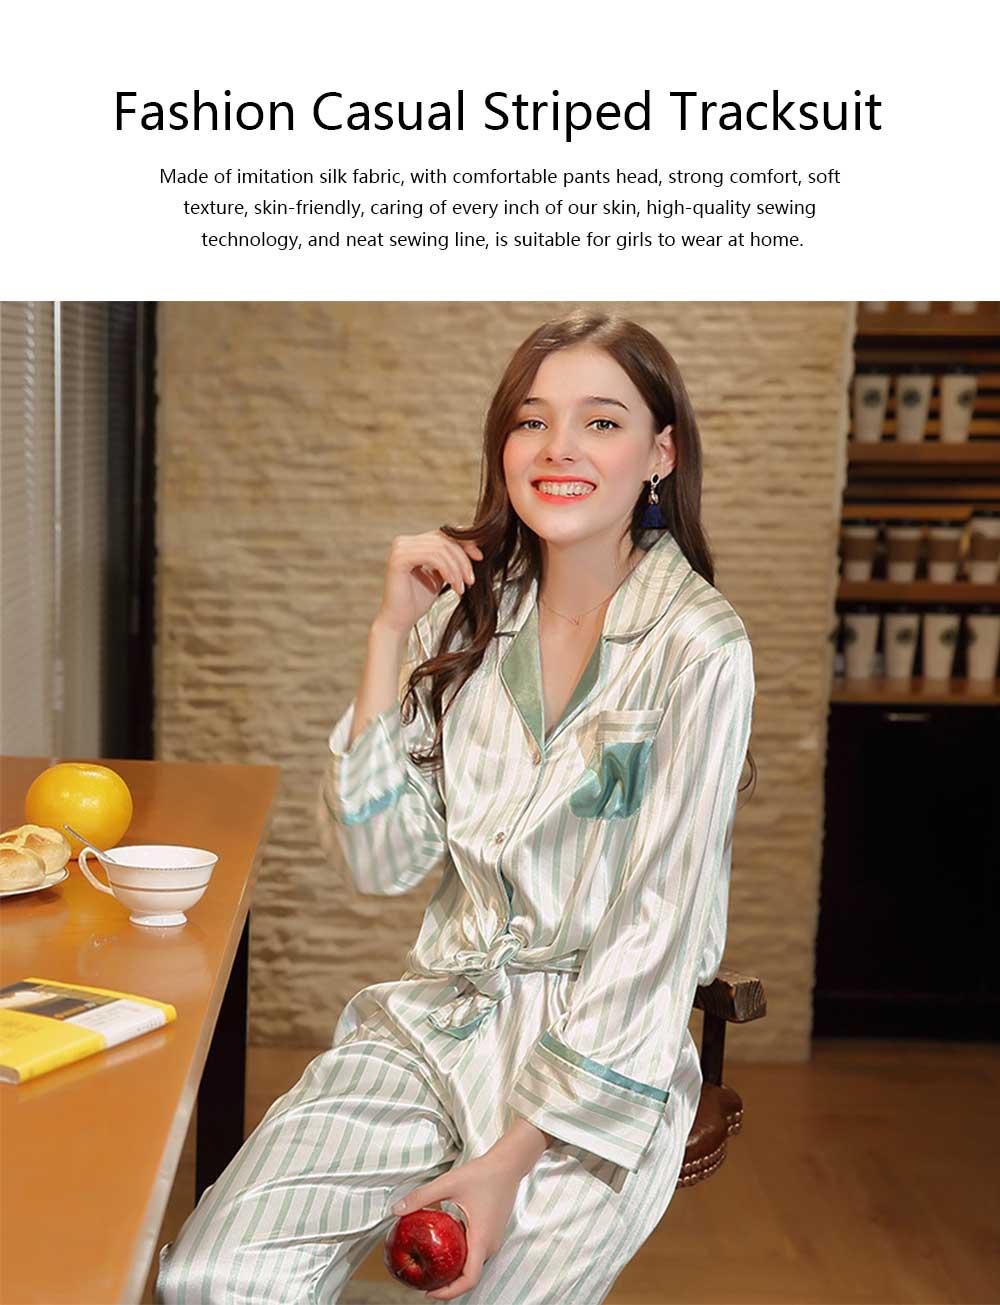 Imitation Silk Fabric Long-sleeved Pajamas set, Classic Lapel Fashion Casual Striped Tracksuit, Spring and Autumn 2019 0